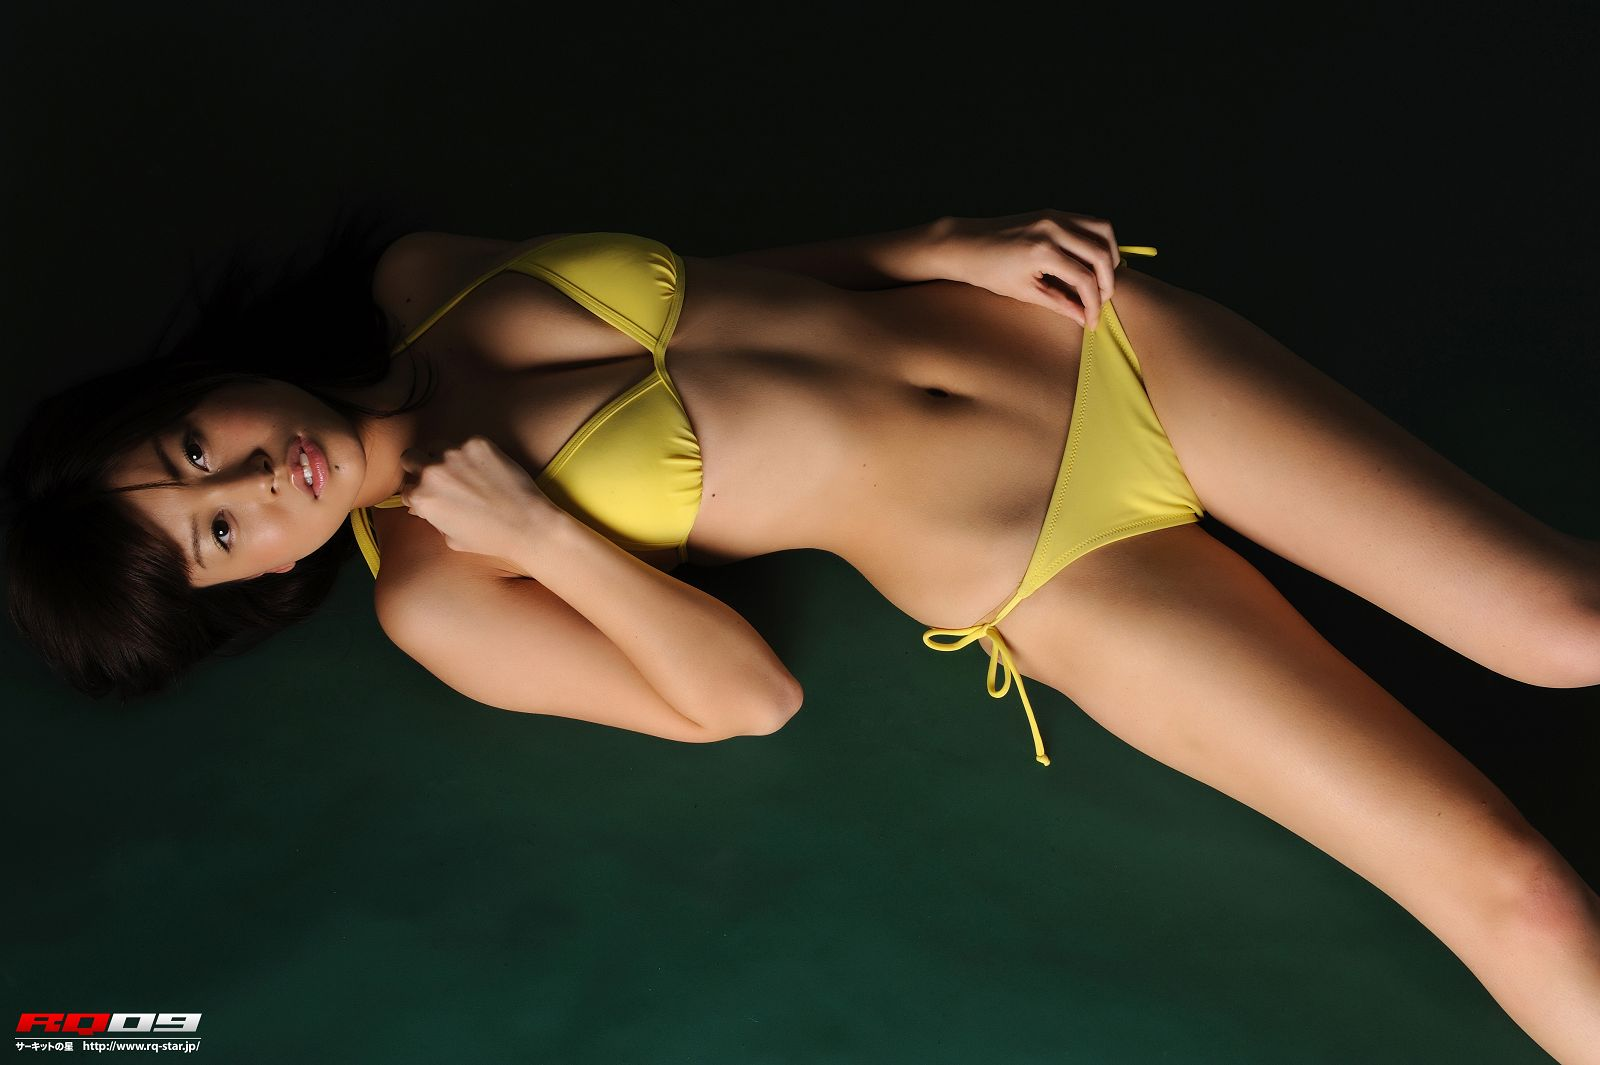 [RQ STAR美女] NO.0156 Airi Nagasaku 永作あいり Swim Suits[103P] RQ STAR 第3张